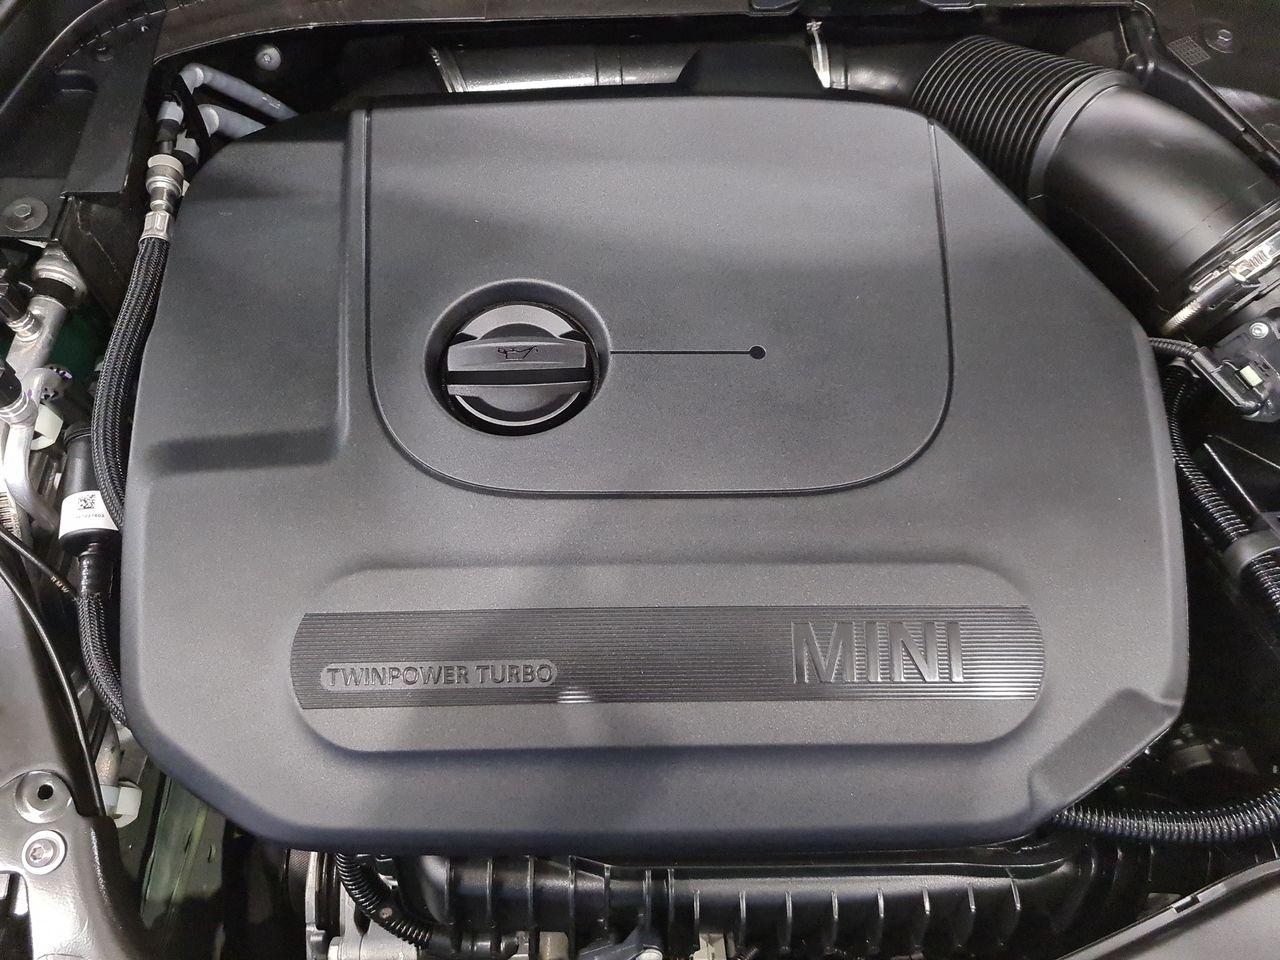 Mini COOPER 5DR HB (LCI)